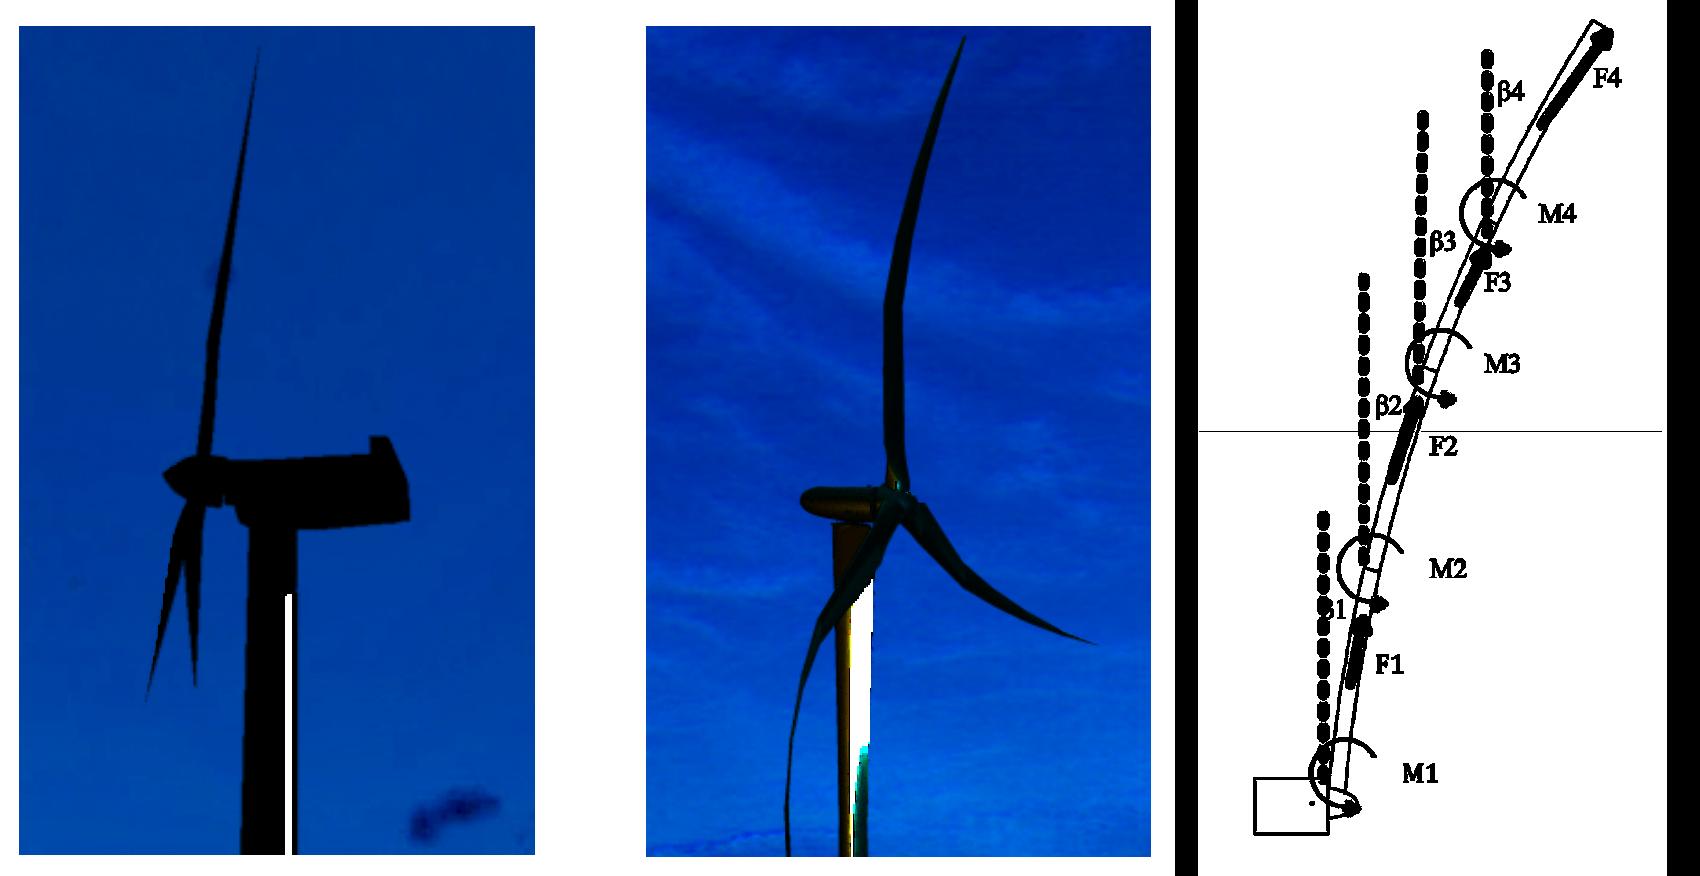 img/segmented-blades.png